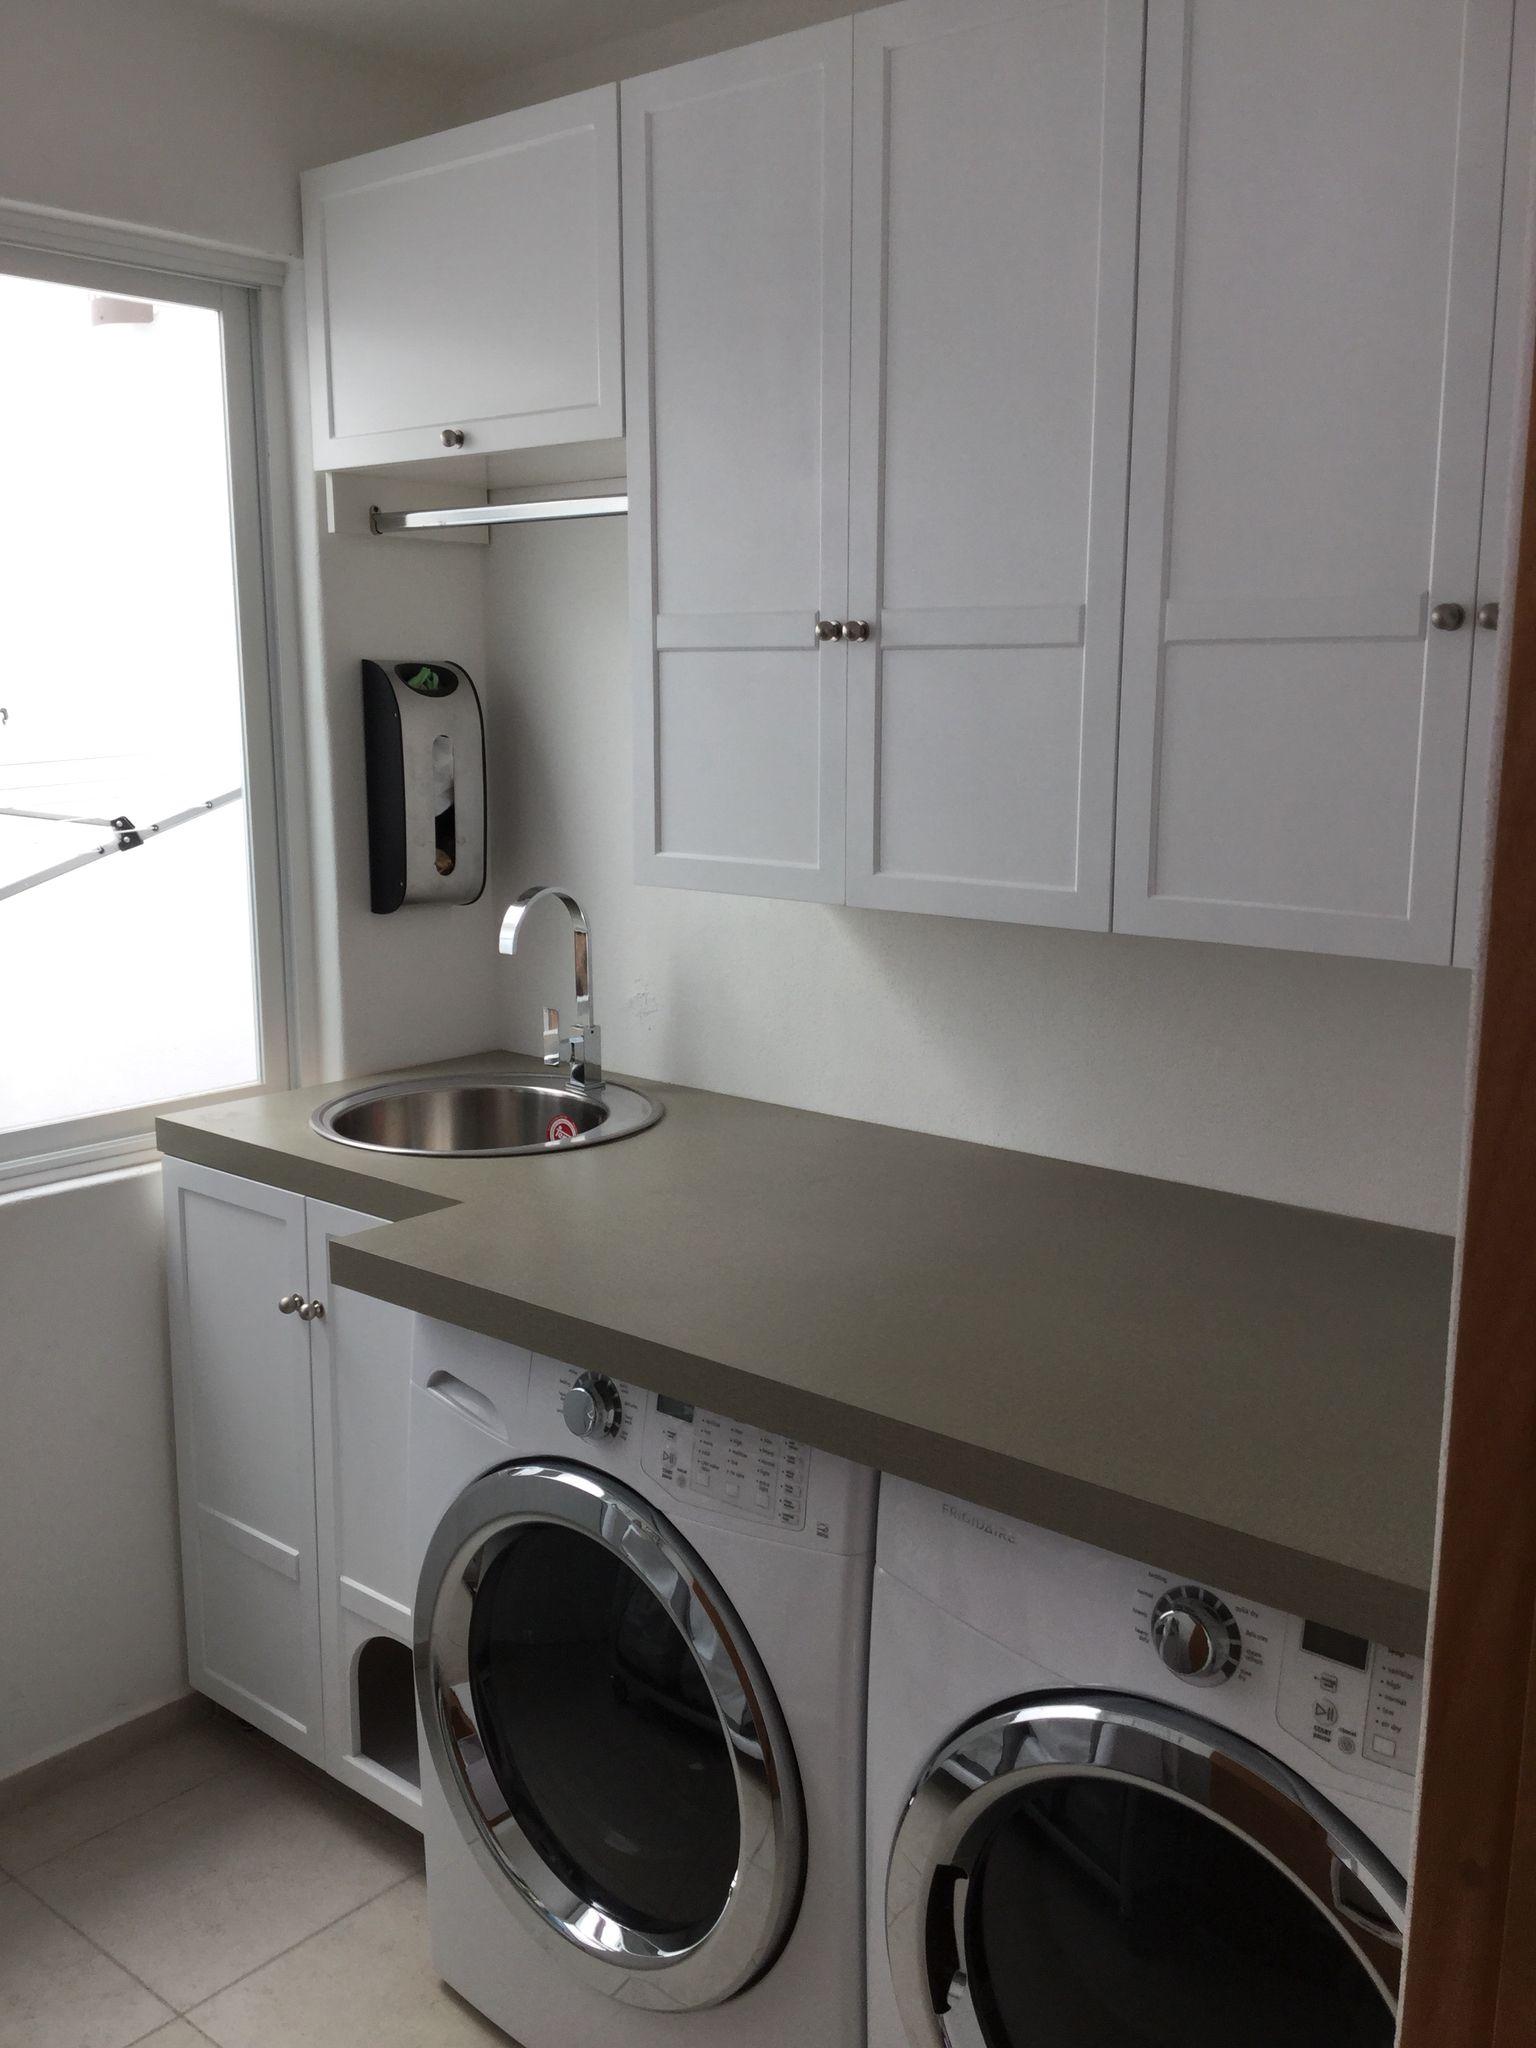 Cuarto de lavado. terceto@yahoo.com.mx 7226 06 64 65 | Laundry room ...